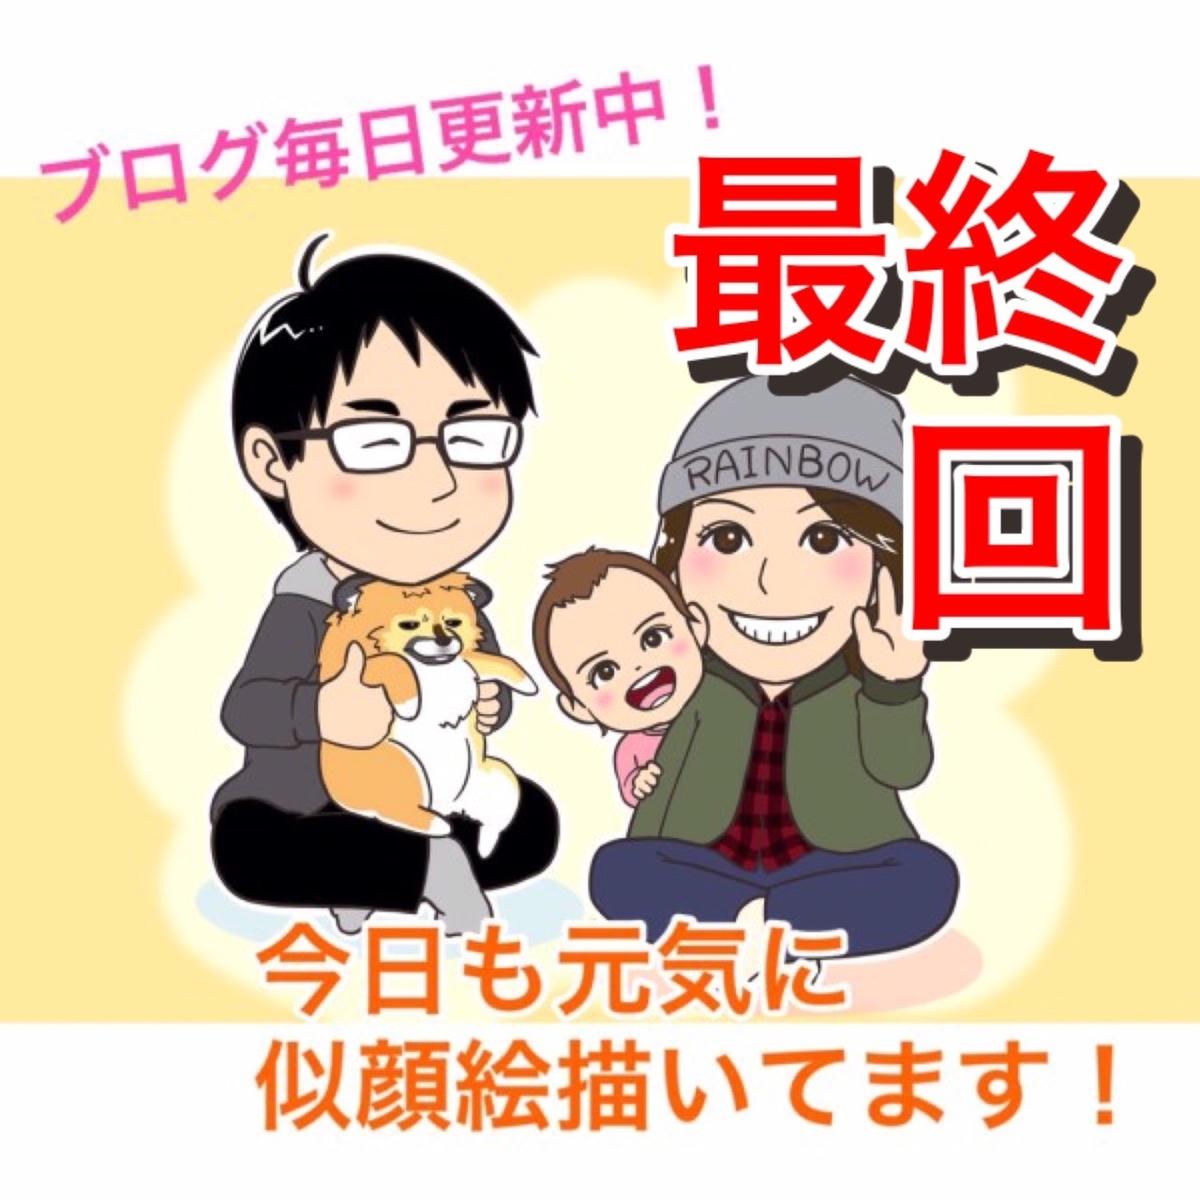 f:id:rainbow_hamada:20200628213634j:plain